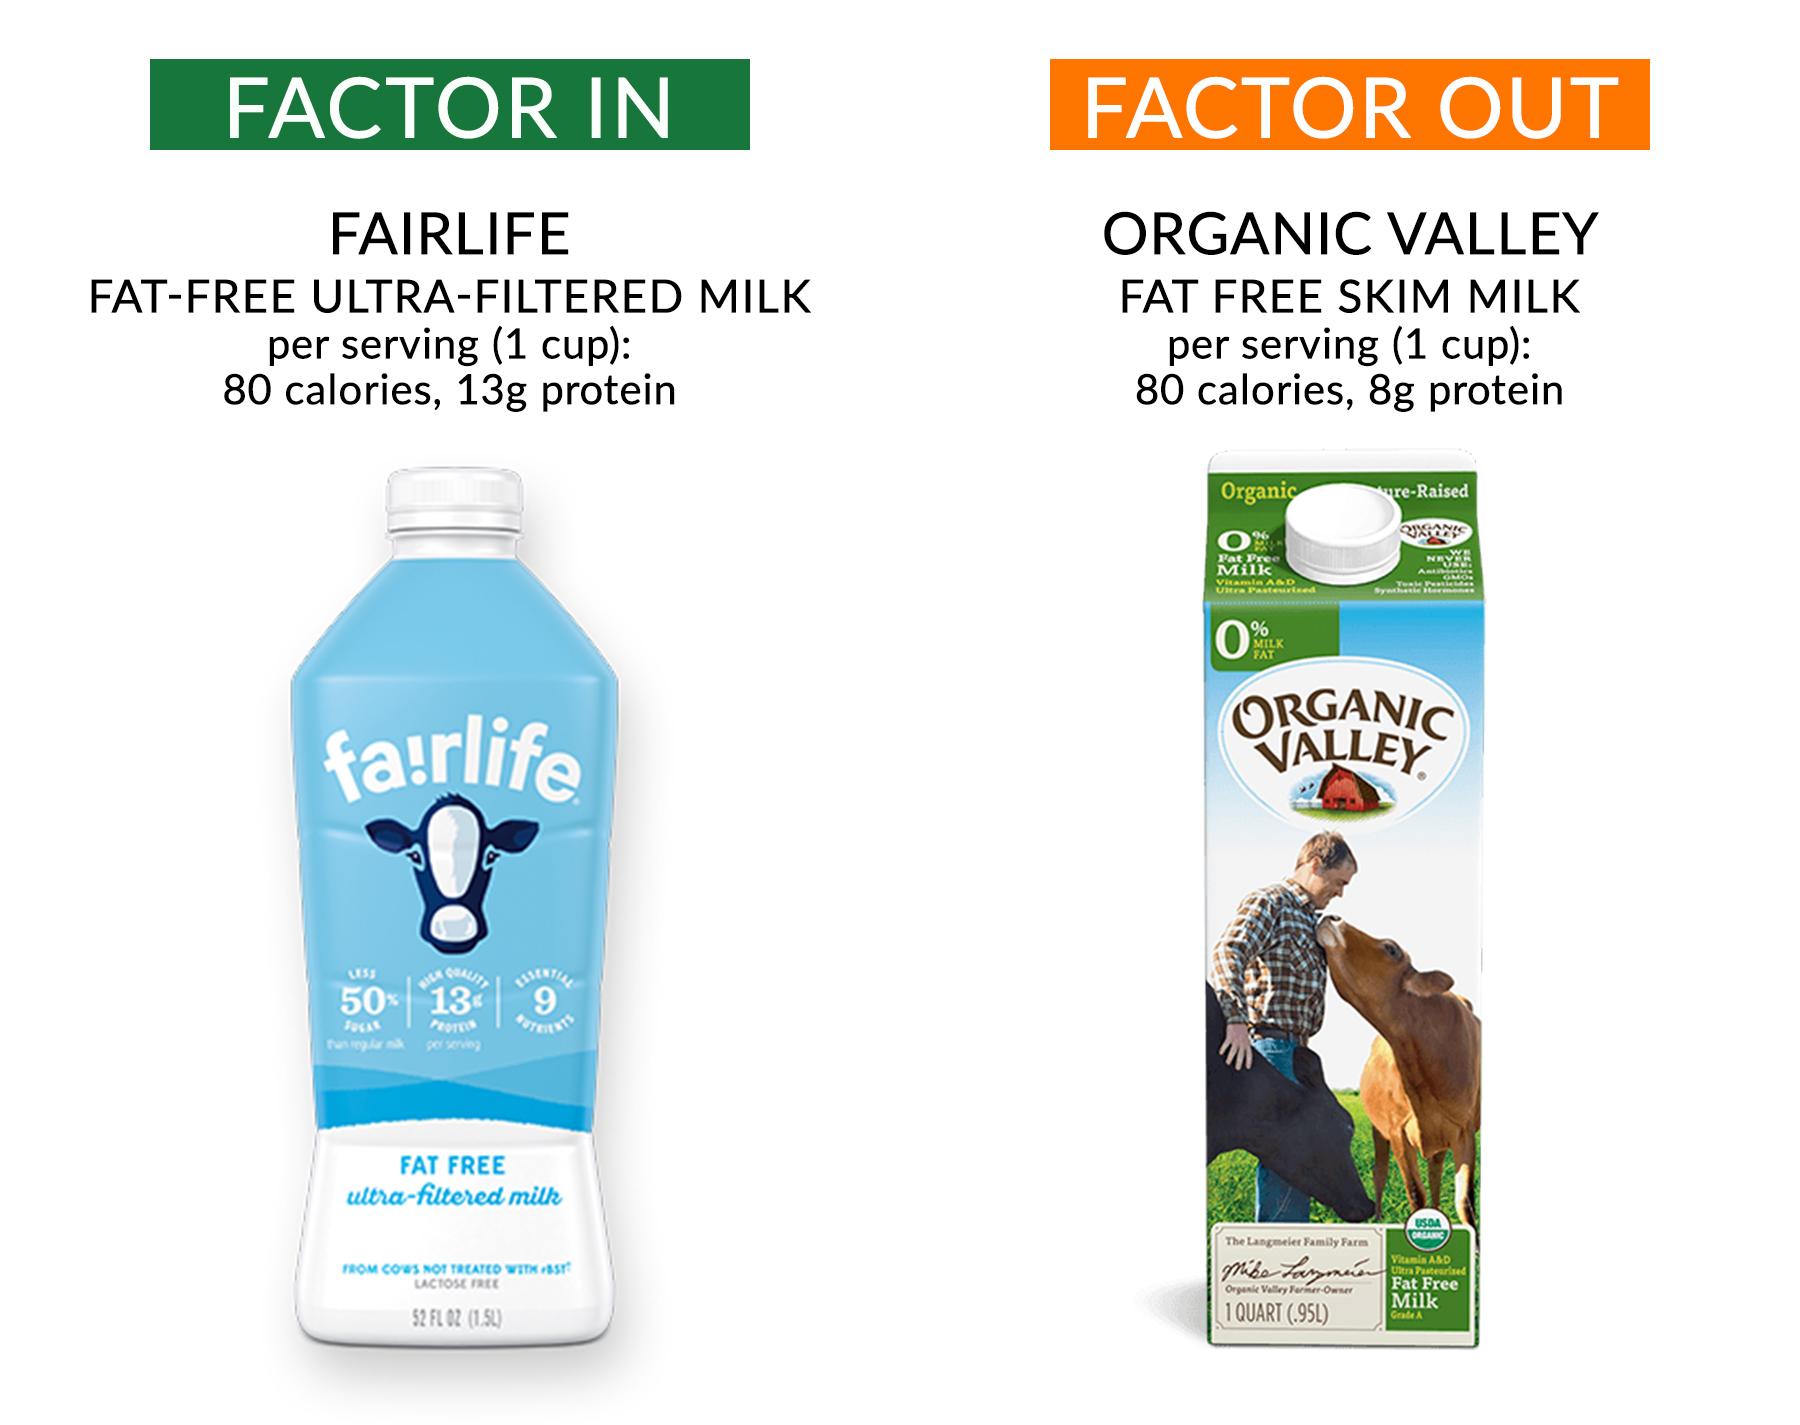 fairlife milk vs organic valley fat free skim milk